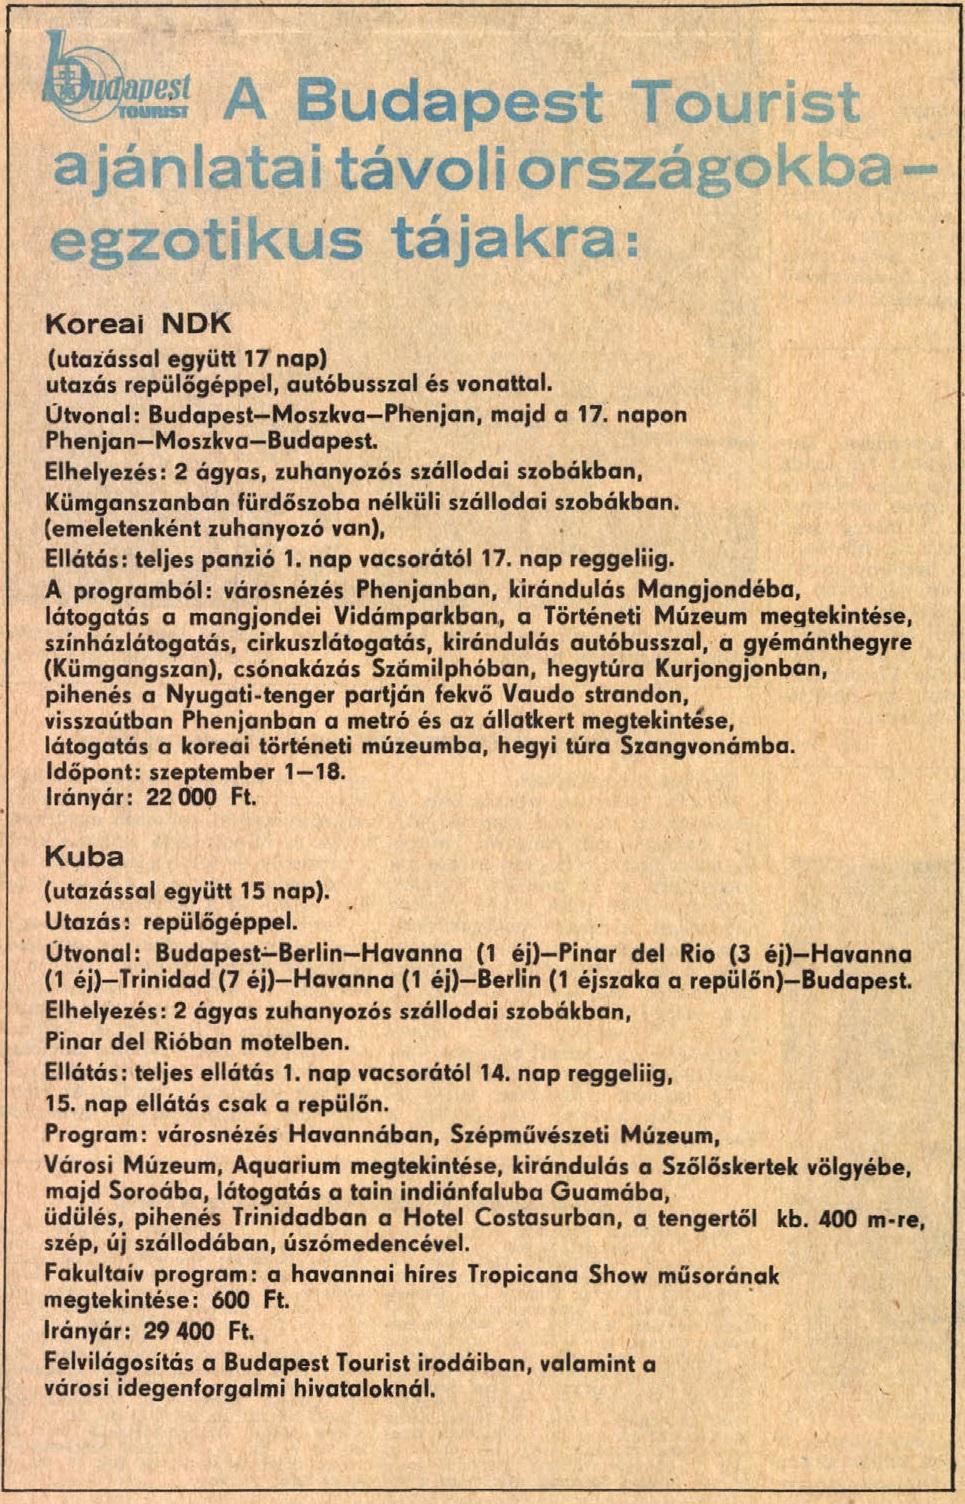 idokapszula_nb_i_1983_84_siofok_raba_eto_mnk_donto_reklam_3.jpg